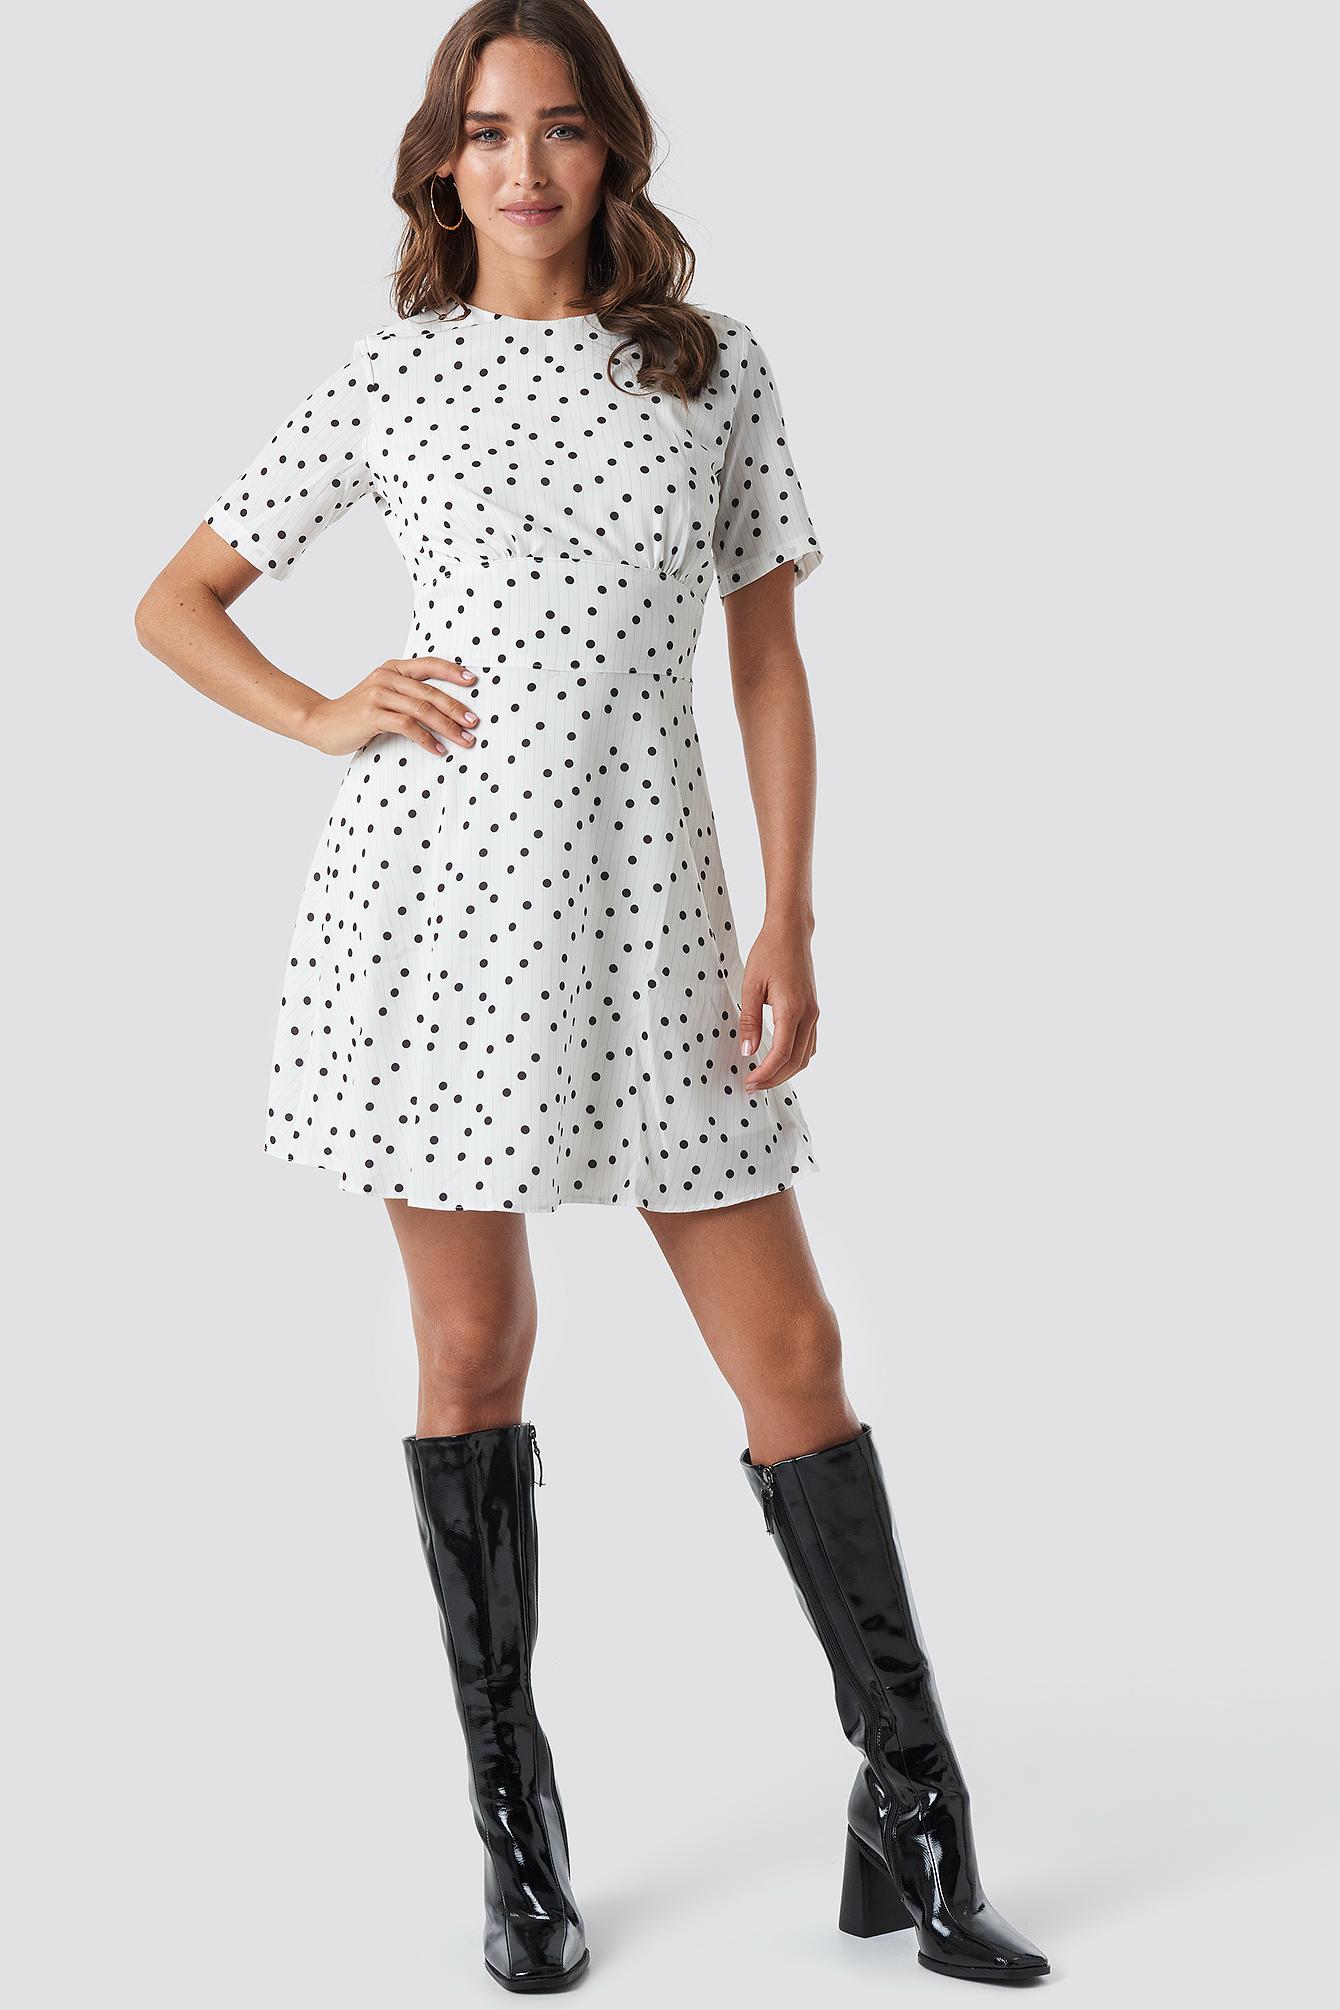 Yol Polka Dot Dress NA-KD.COM